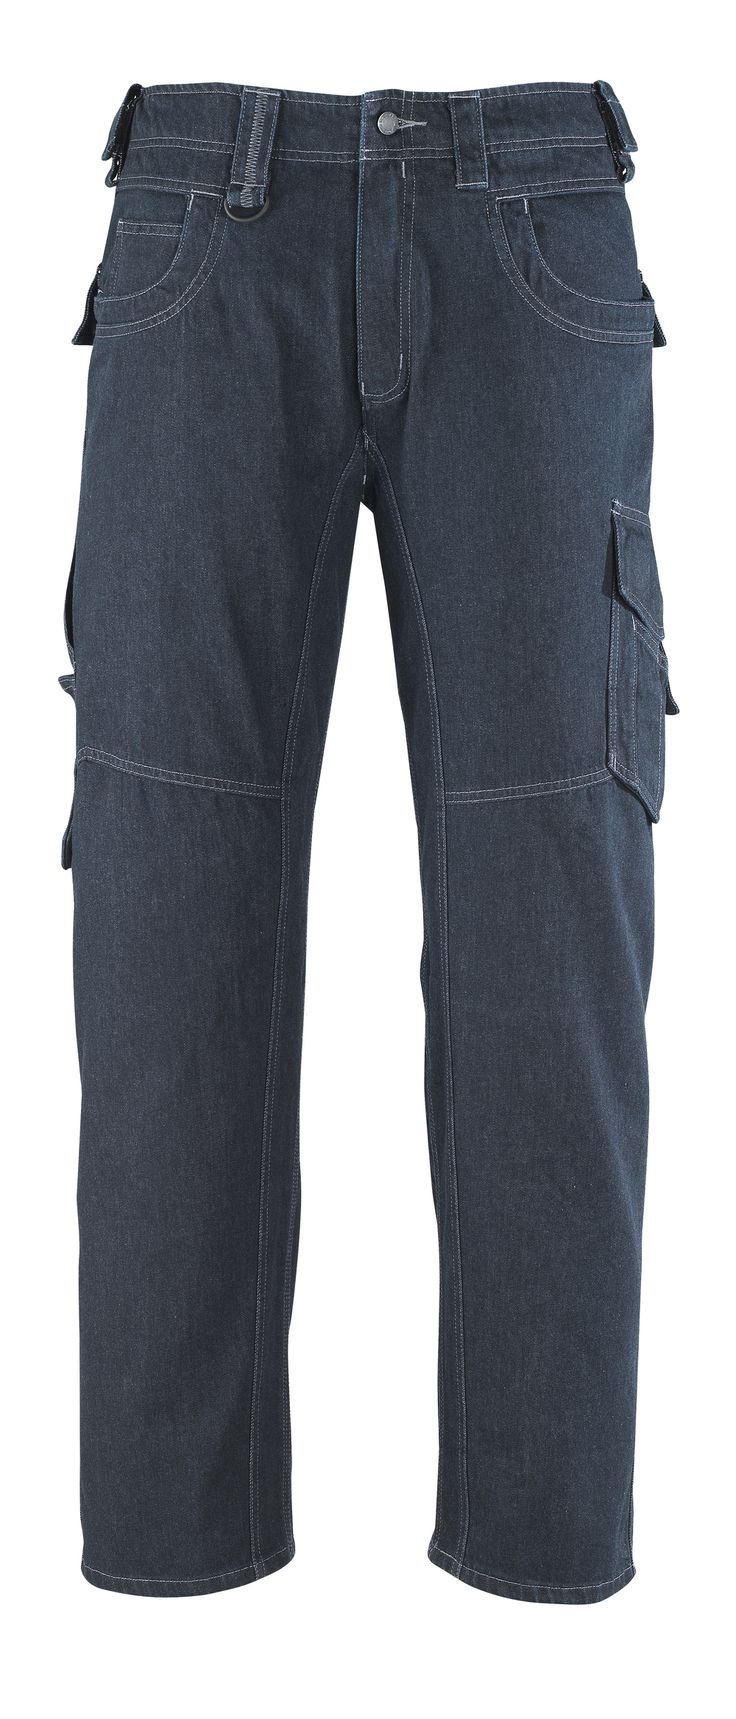 MASCOT® Workwear - Jeans MASCOT® Oakland